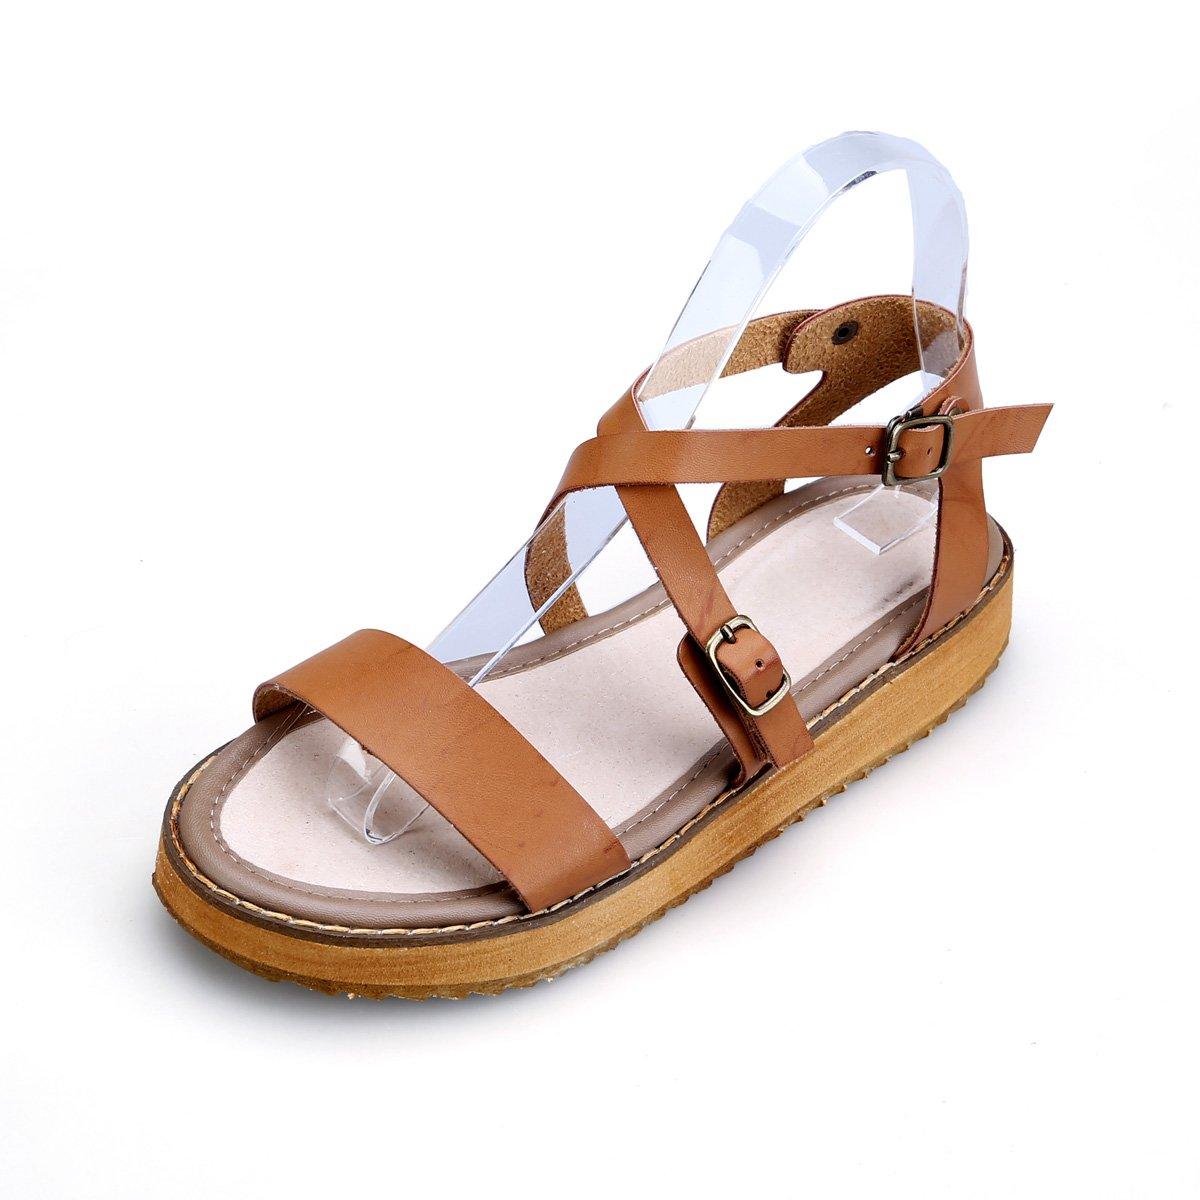 gracosy Damen Sandalen, Sommer Leder Pantoletten Flach Sandalen Damen Slip-Ons Vintage Slipper Zehentrenner Clogs Bequem Blume Sommerschuhe  42 EU|Braun-a